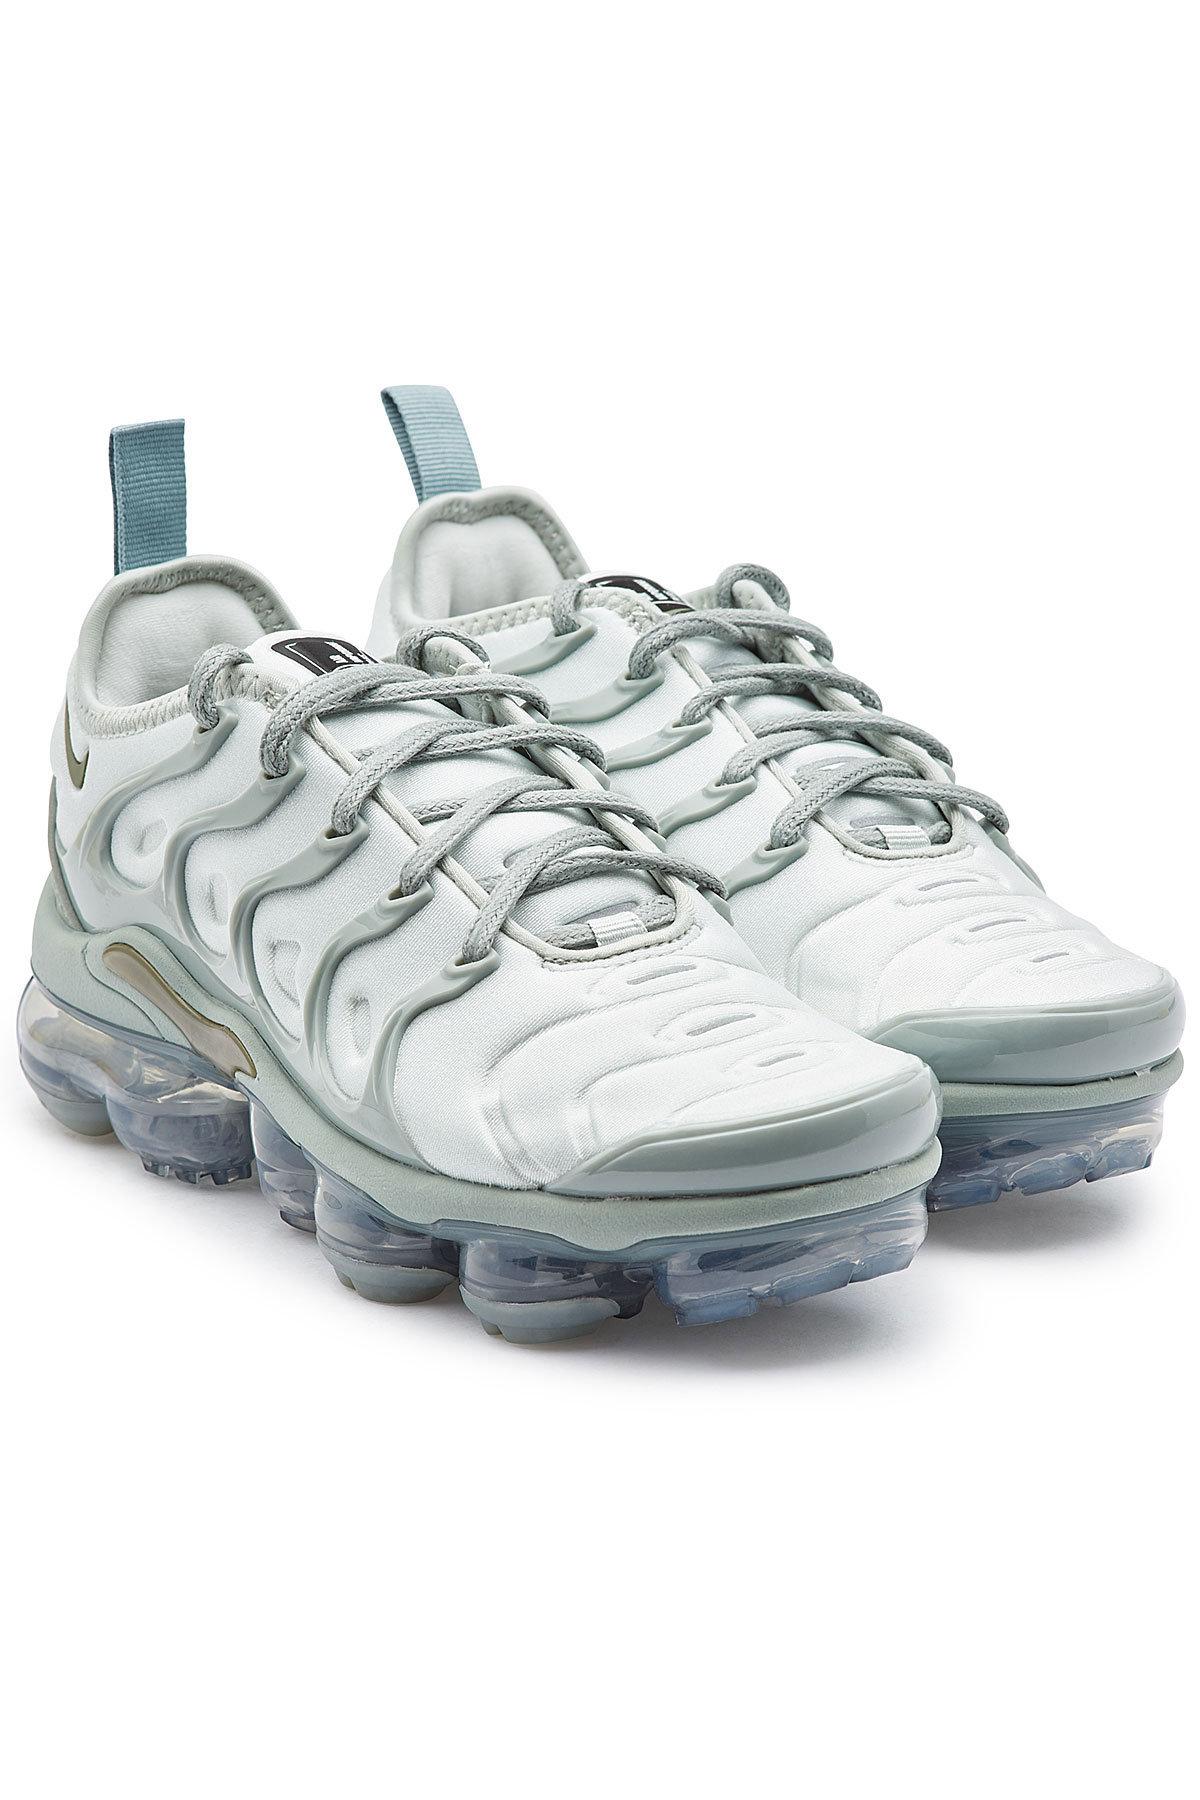 san francisco e4ef7 c00db Nike Women s Air Vapormax Plus Casual Shoes, Grey In Green